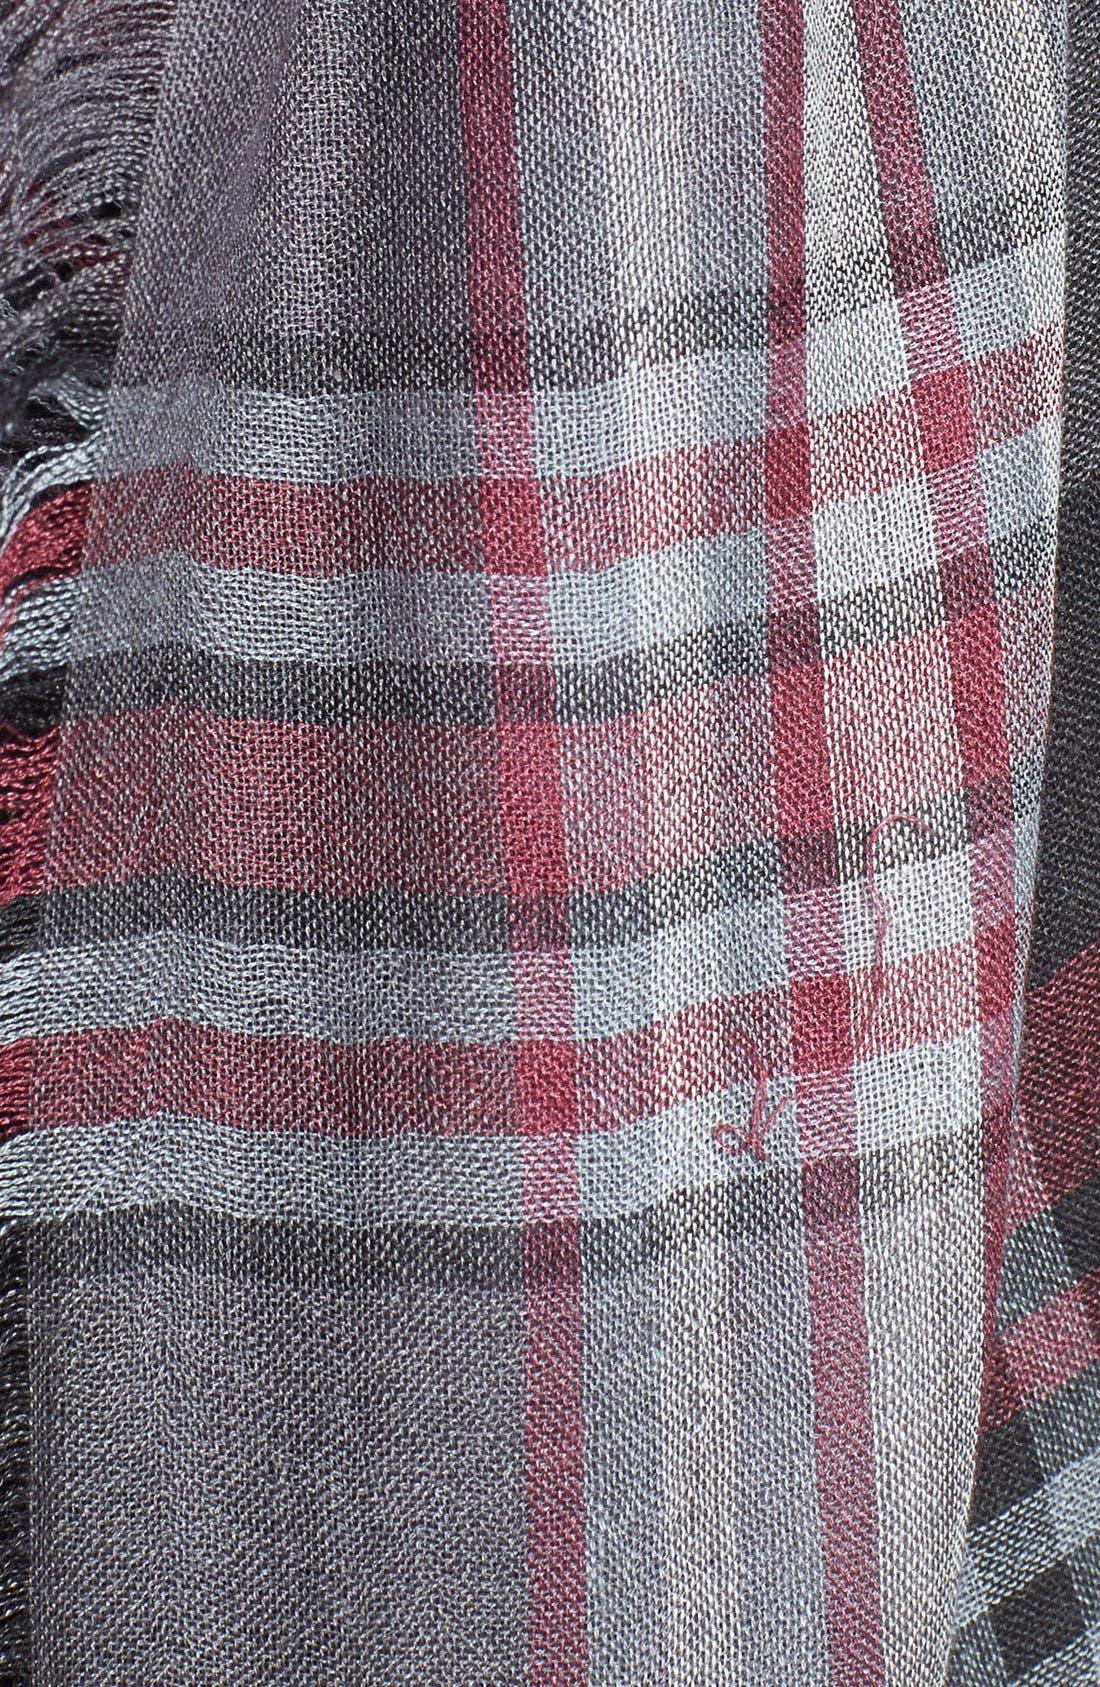 Alternate Image 3  - Nordstrom 'Heritage Plaid' Cashmere & Silk Scarf